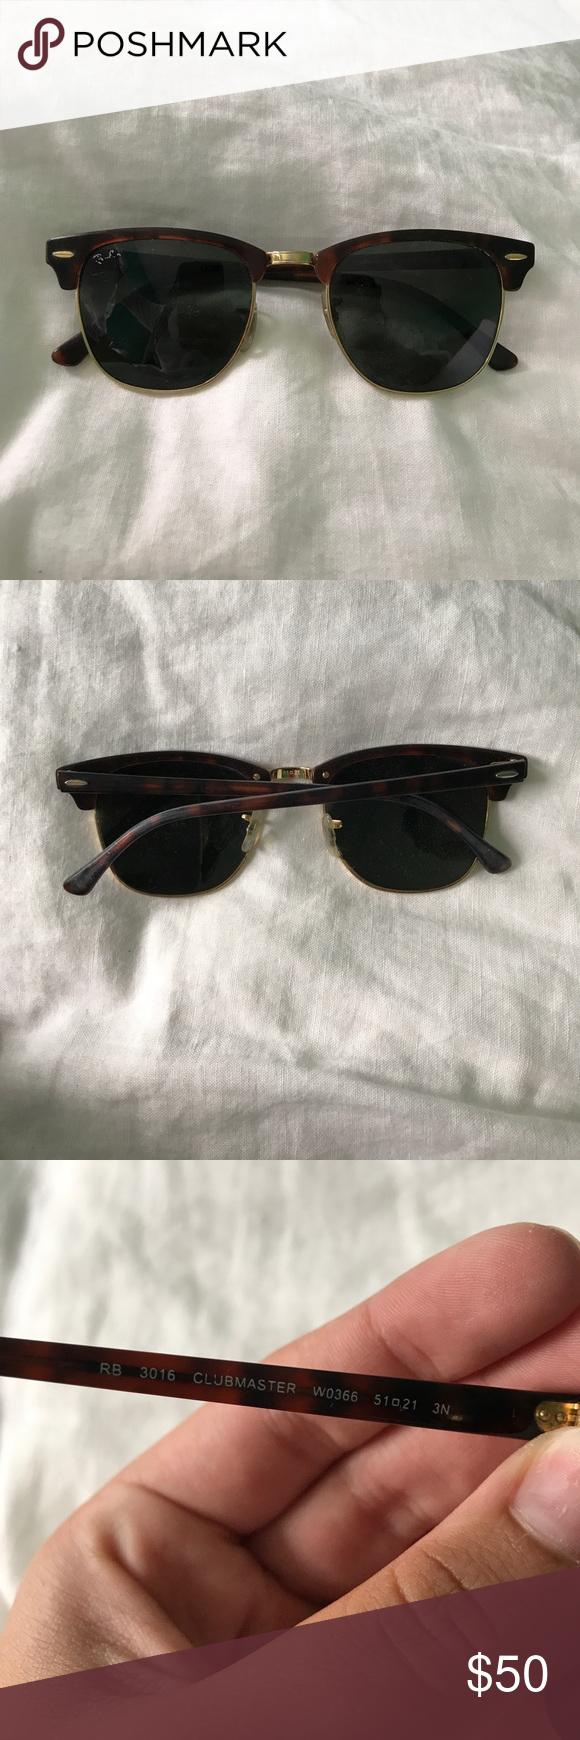 Ray Ban Club Masters Ray Bans Sunglasses Accessories Ray